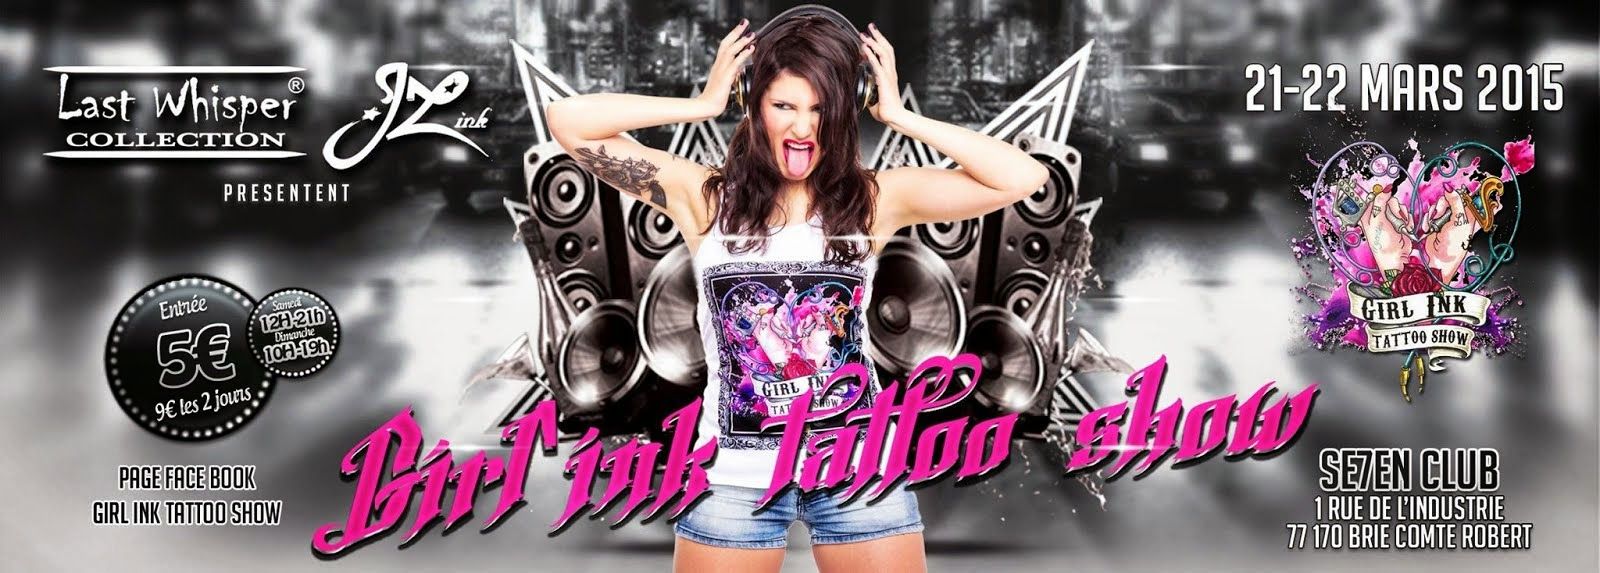 Partenaire du Girl Ink Tattoo Show